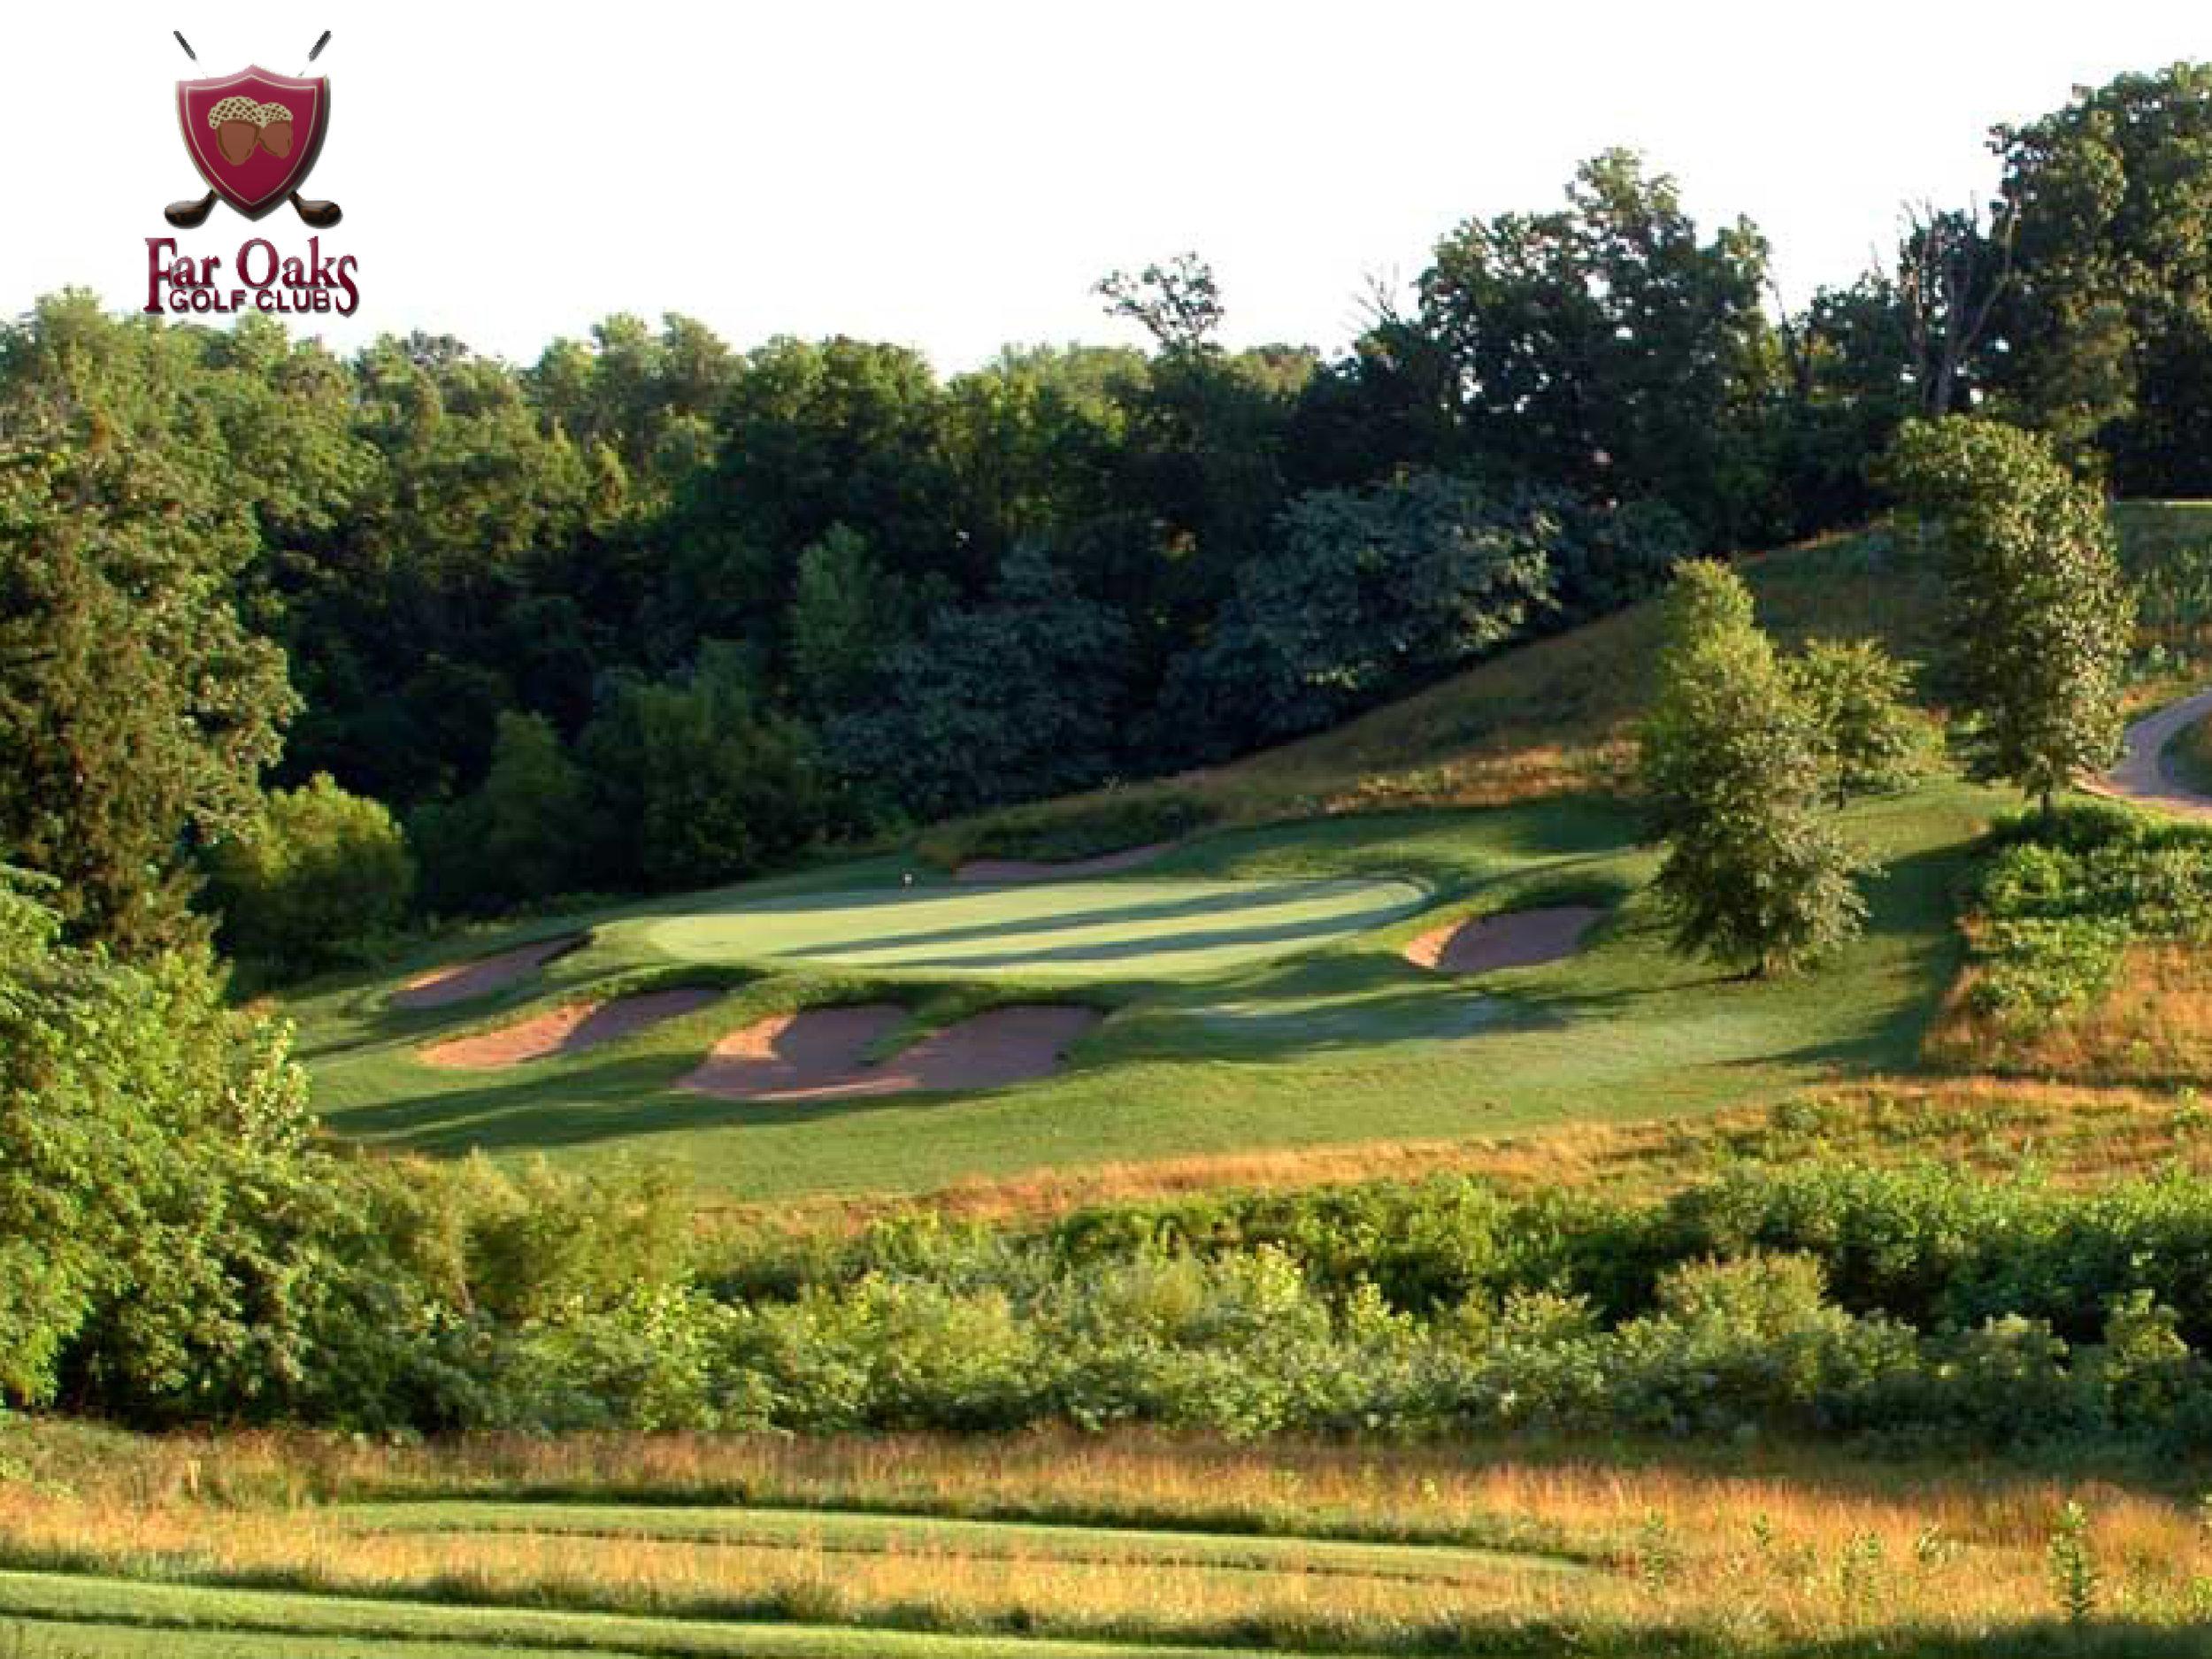 CASEYVILLE, IL - Far Oaks Golf ClubSunday, JUly 28th$110